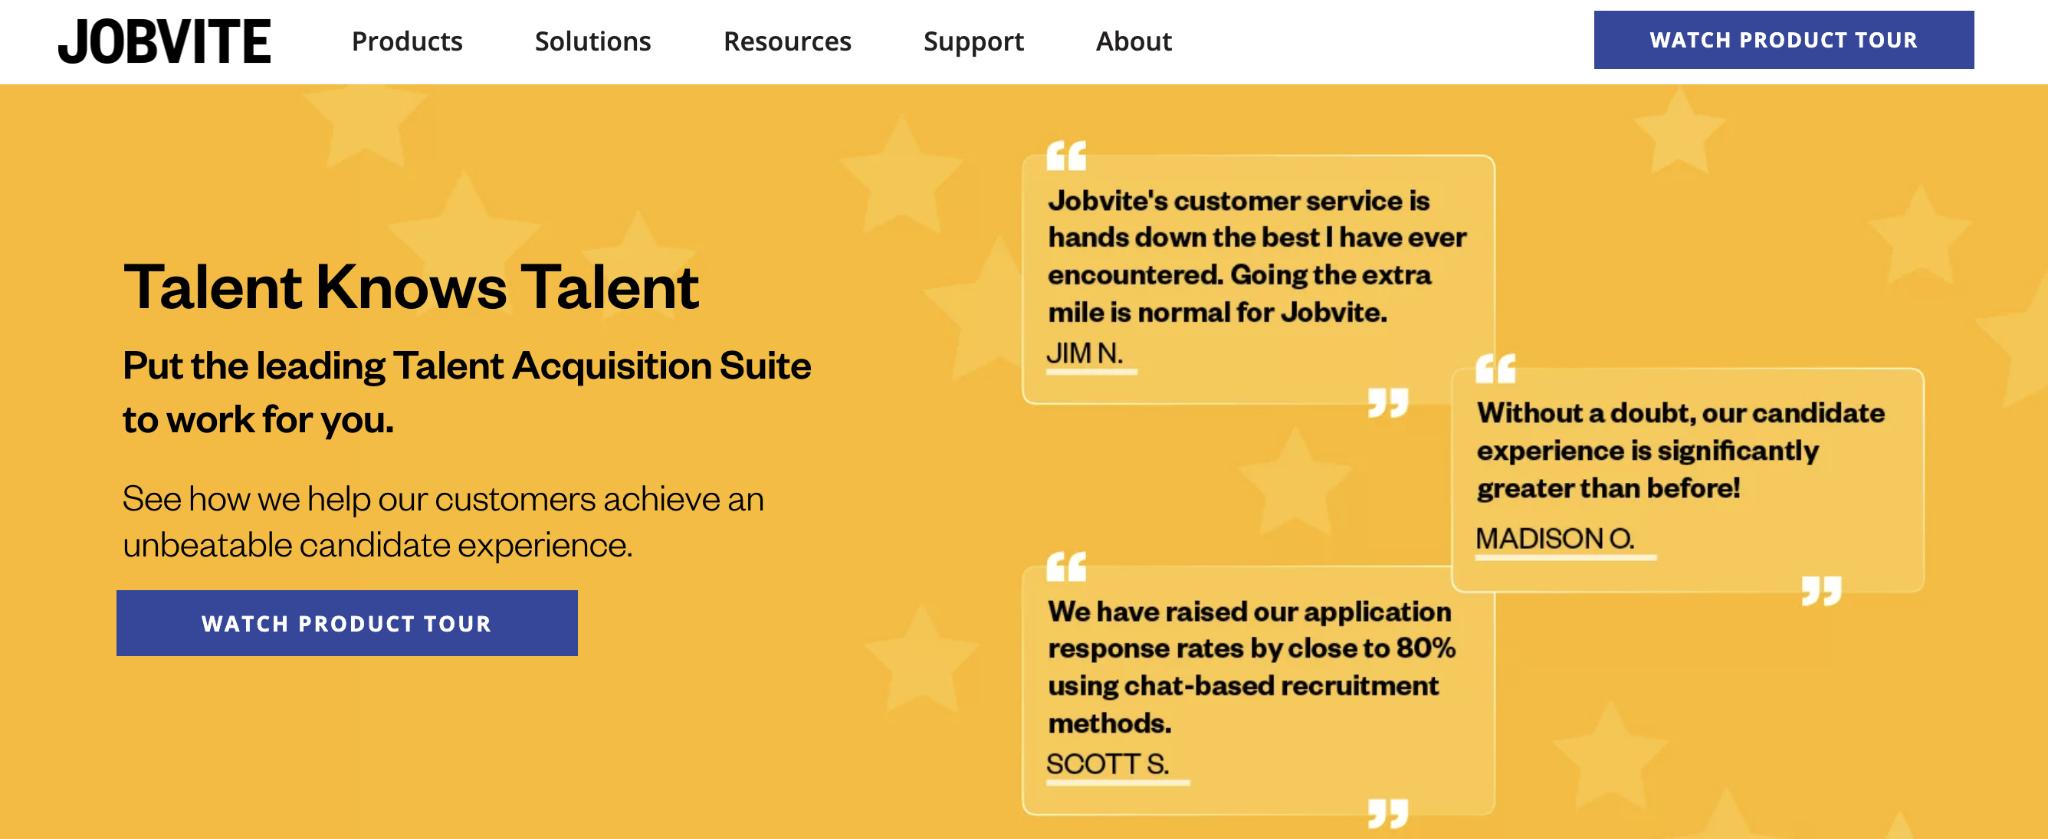 Recruiterbox Competitor #2: Jobvite